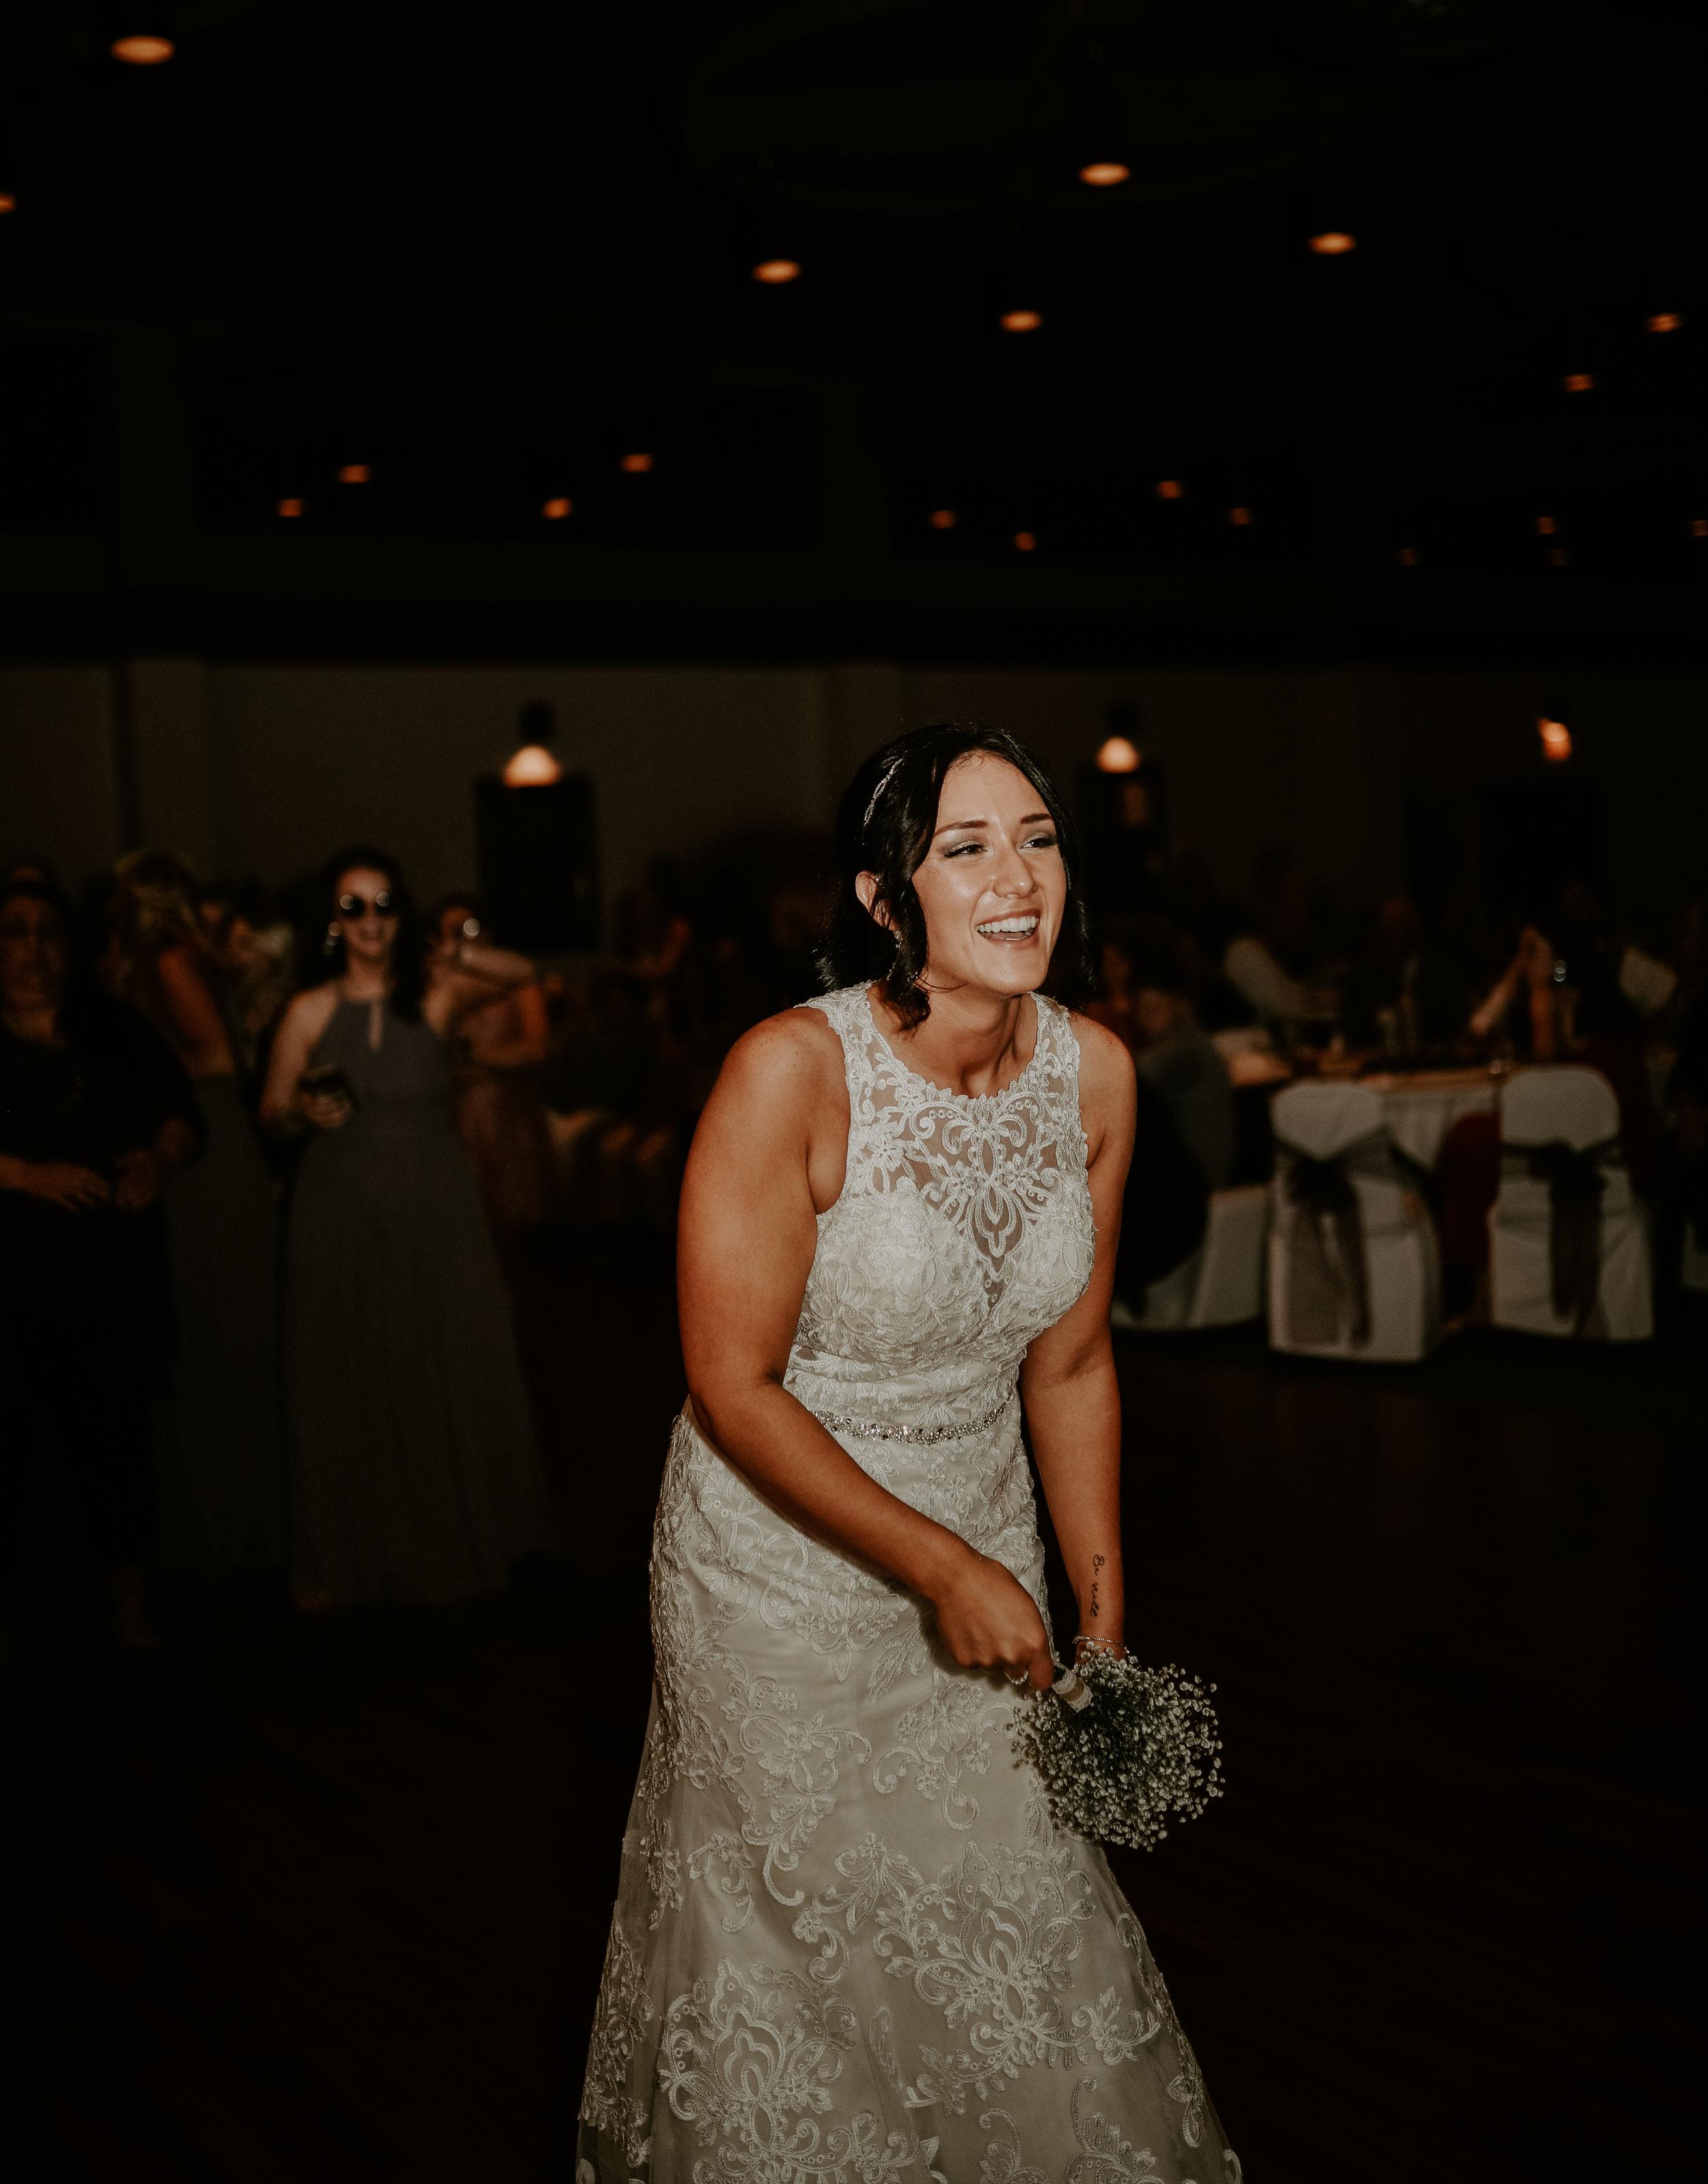 Kylei + Jordan wedding 452 (1 of 1).jpg